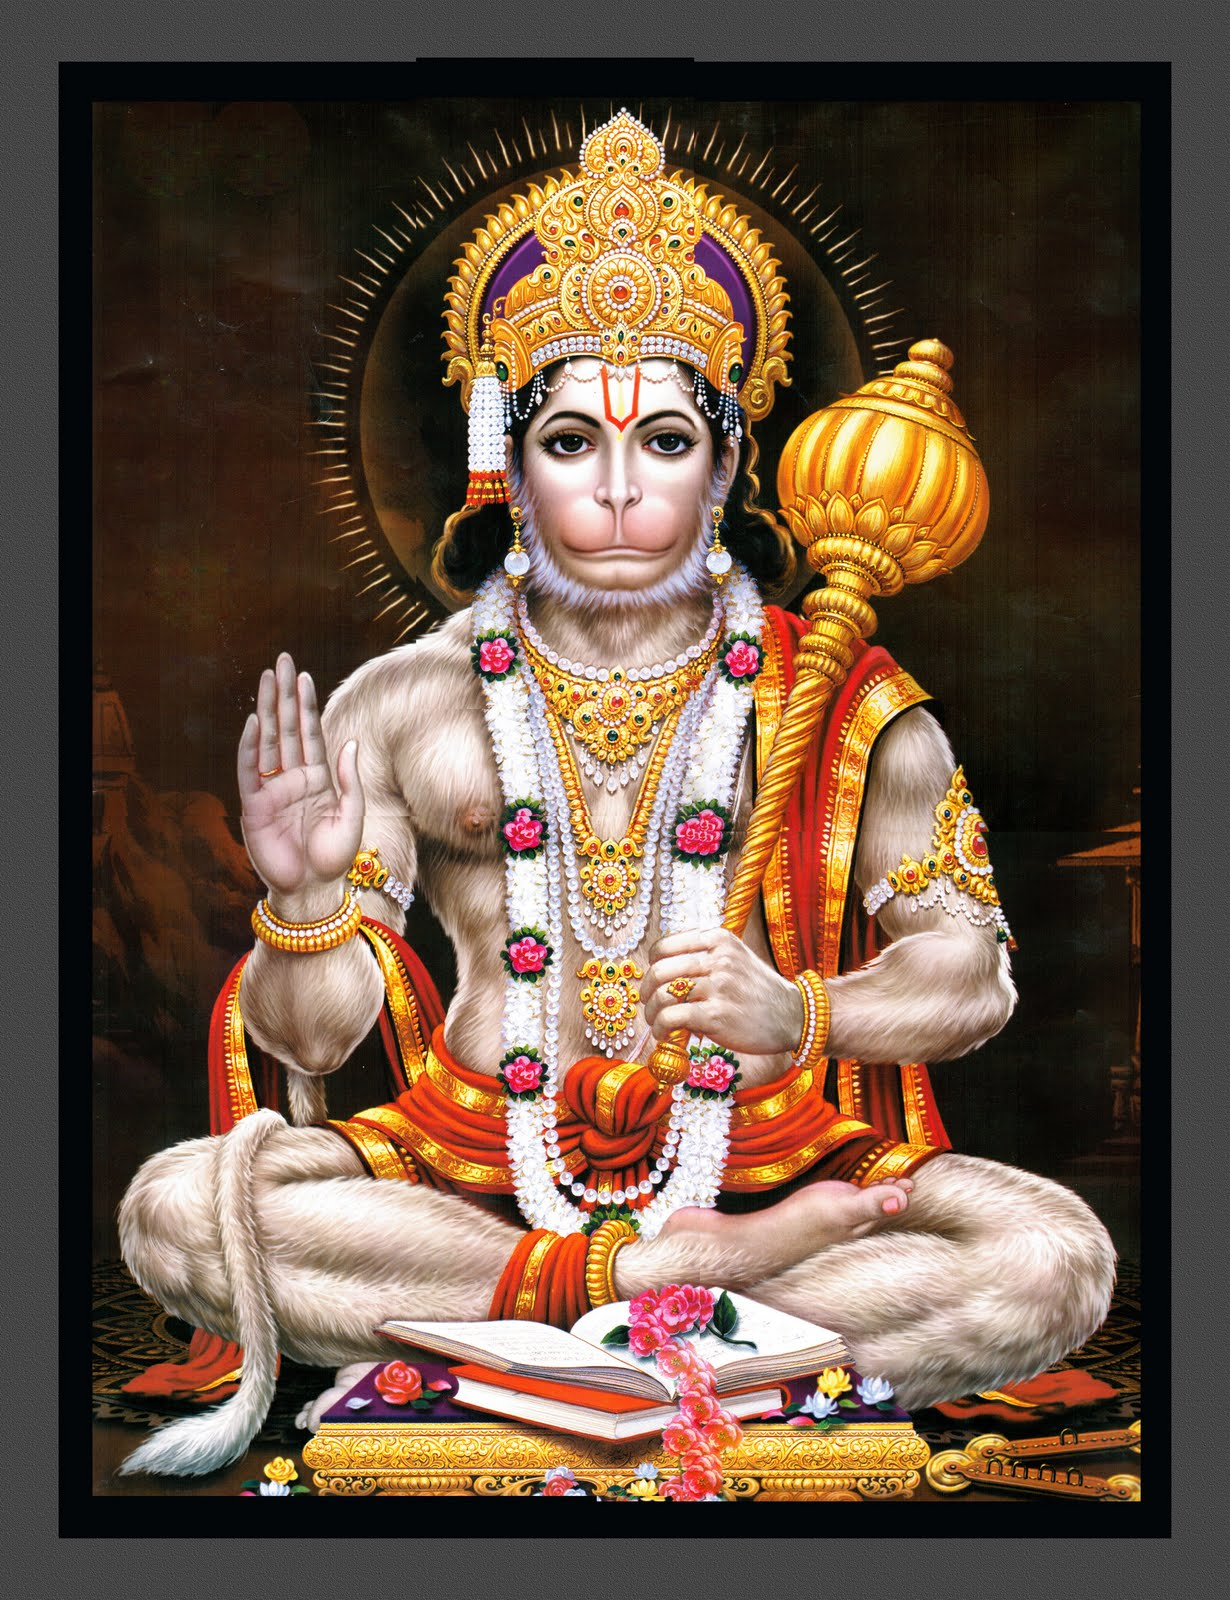 hanuman ji1 prema hara